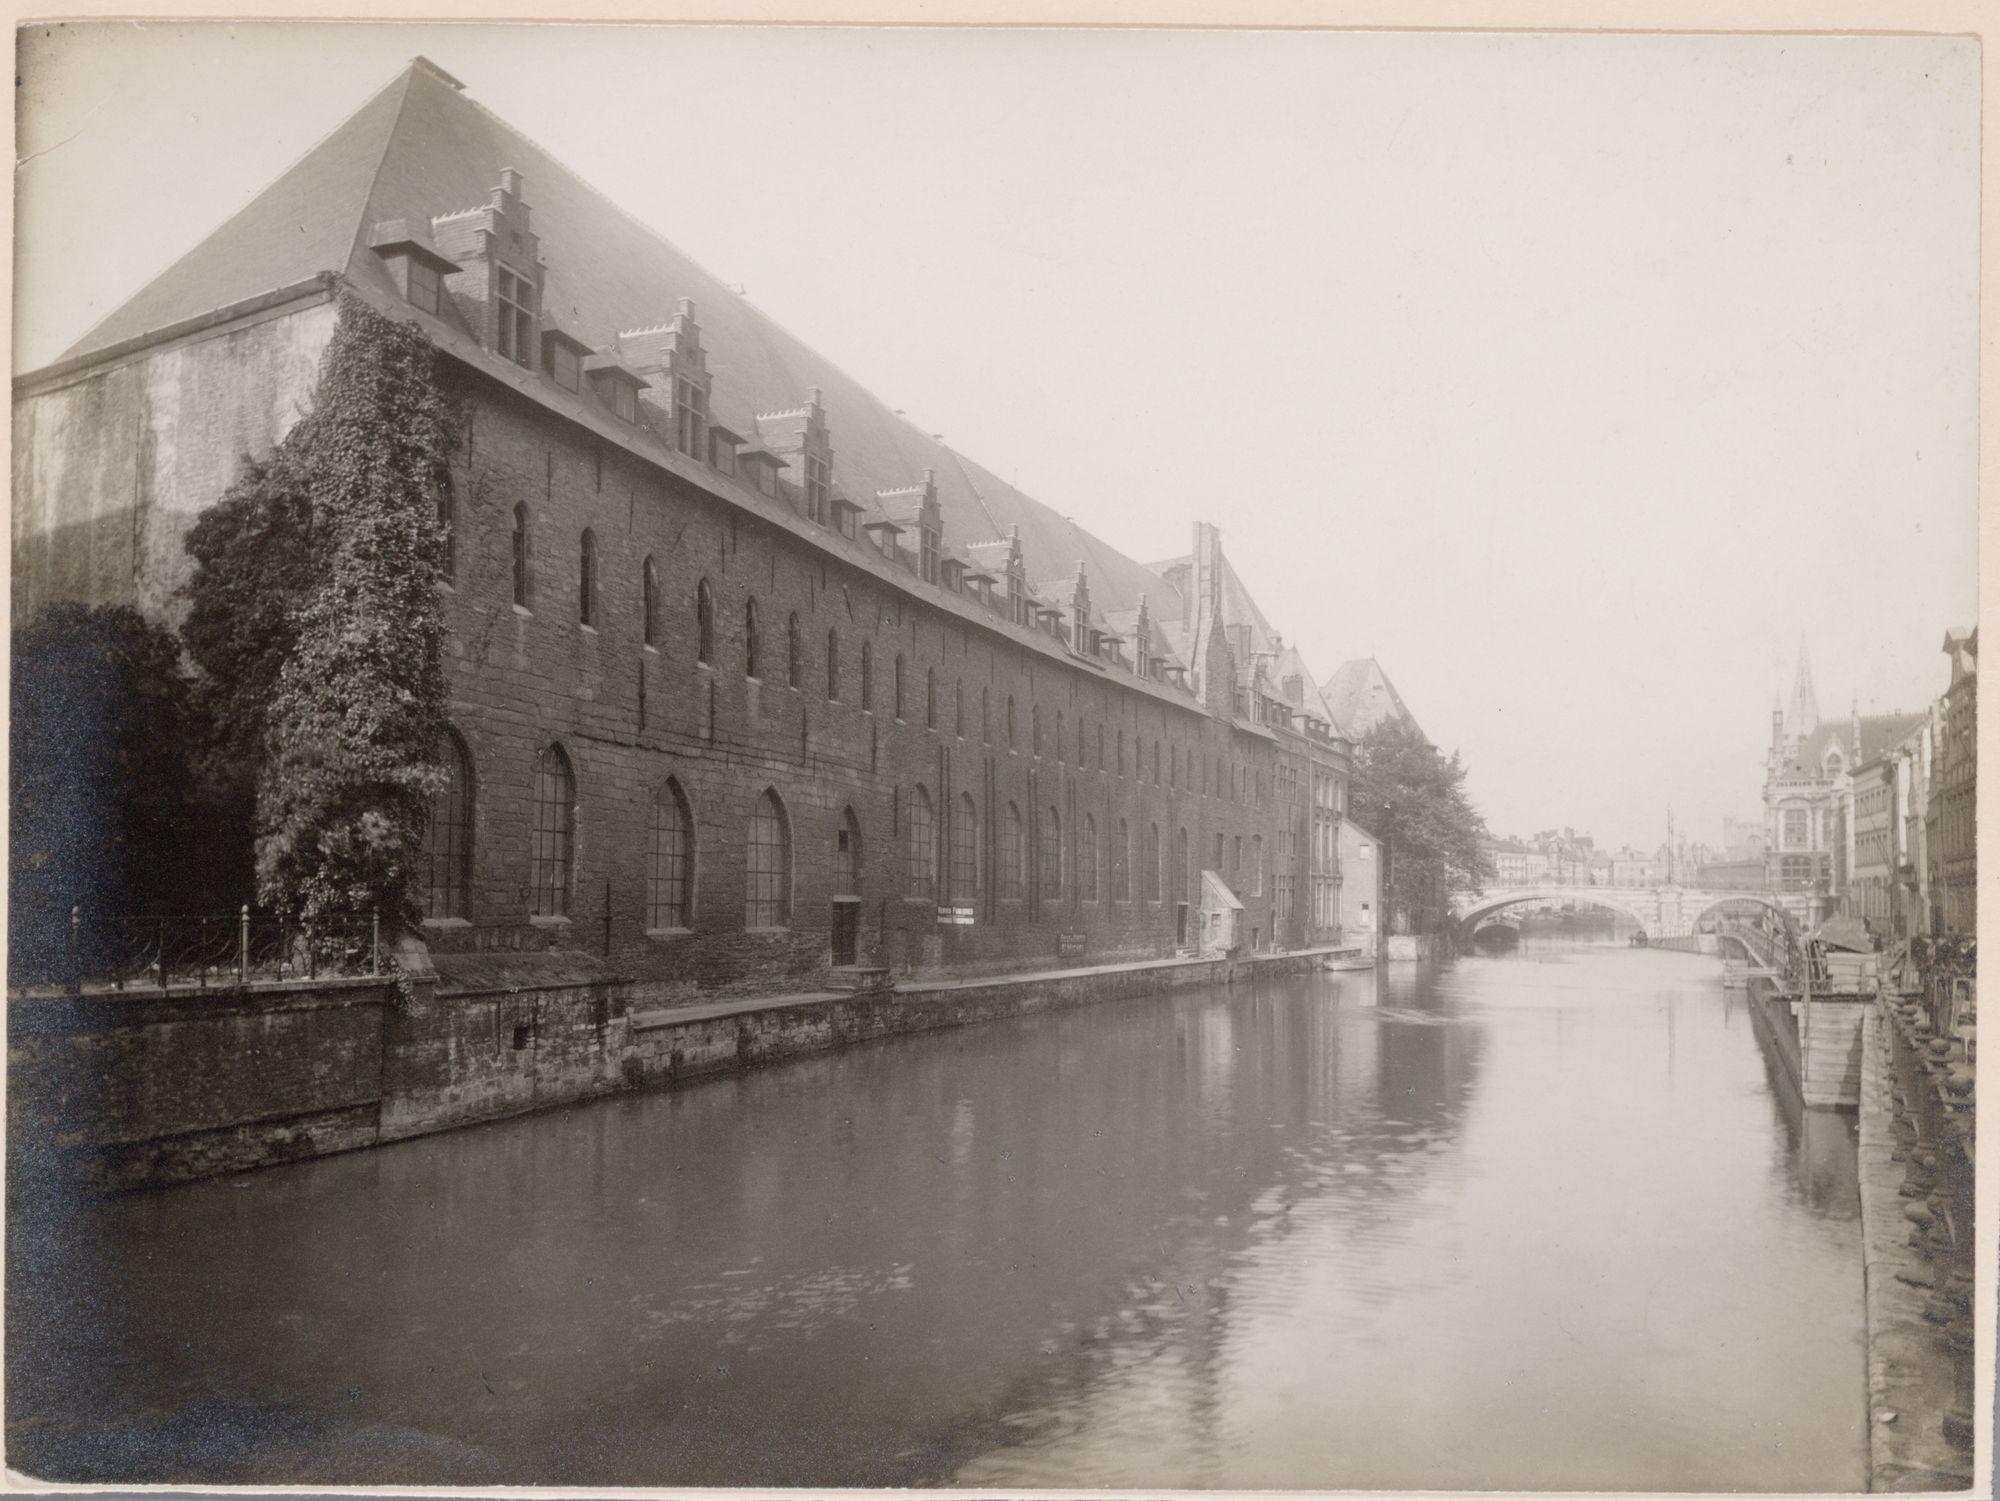 Gent: Predikherenlei: Dominicanenklooster